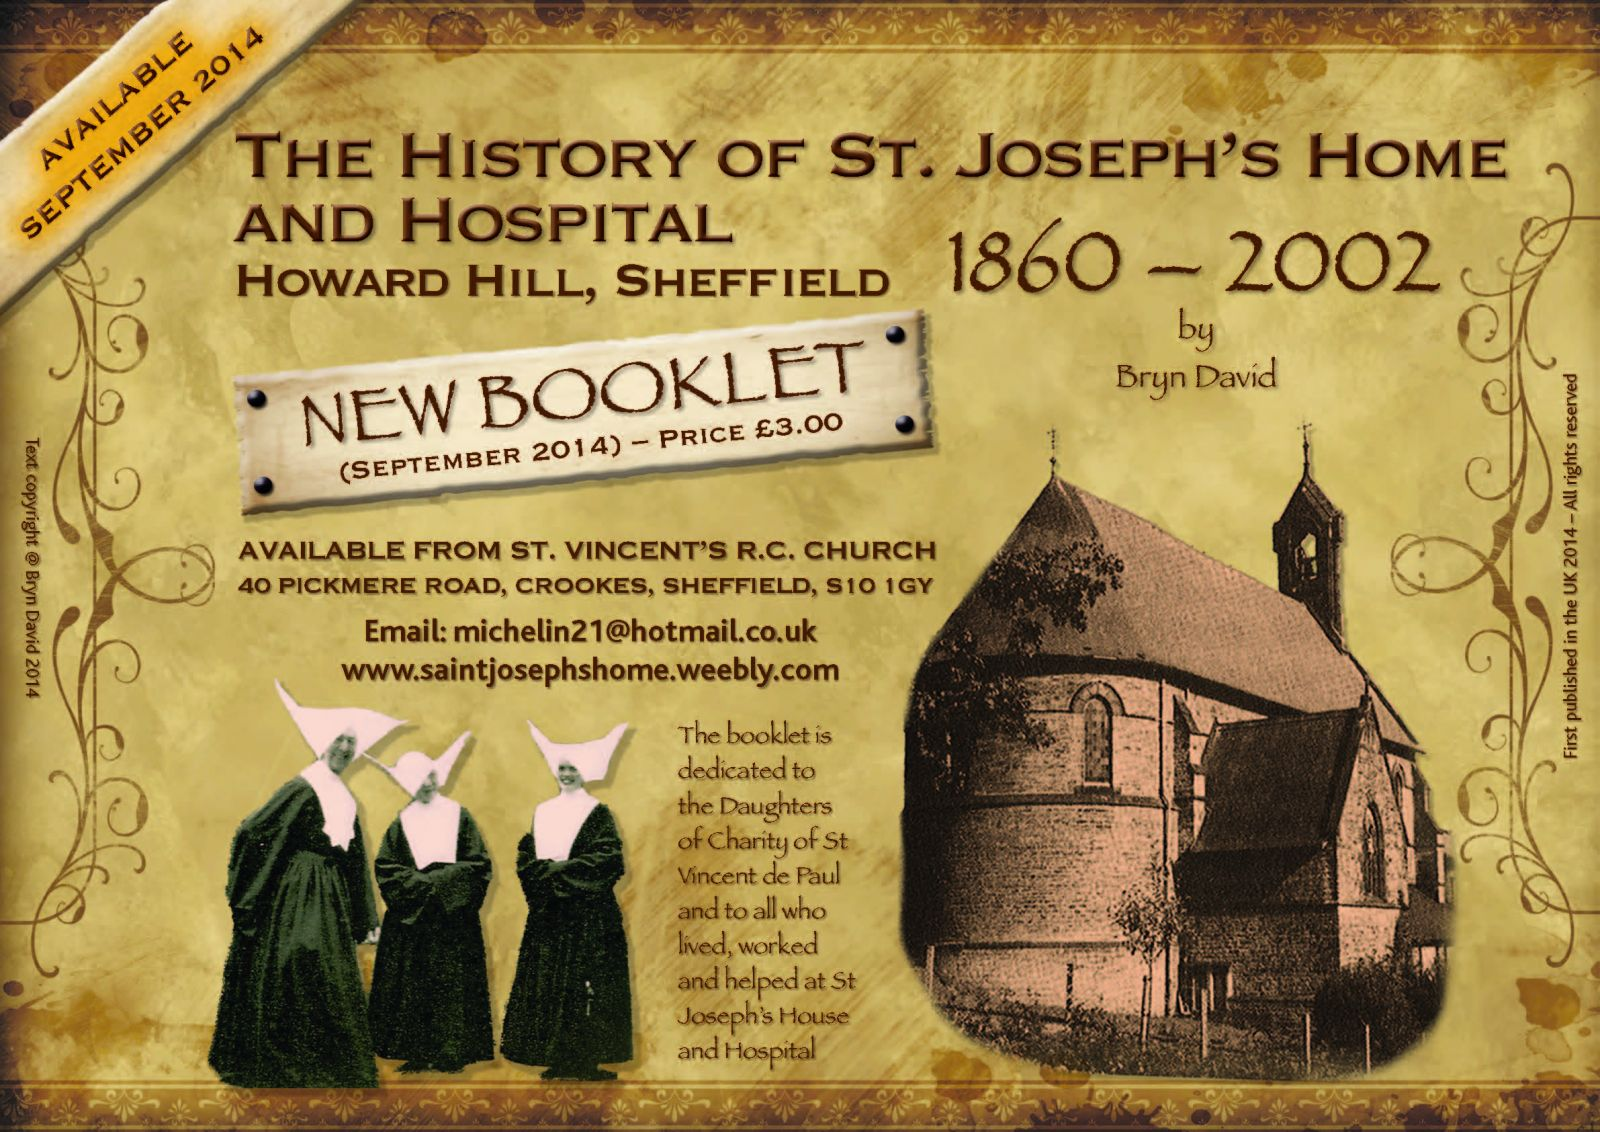 St. Joseph's Home & Hospital : 1860 - 2002